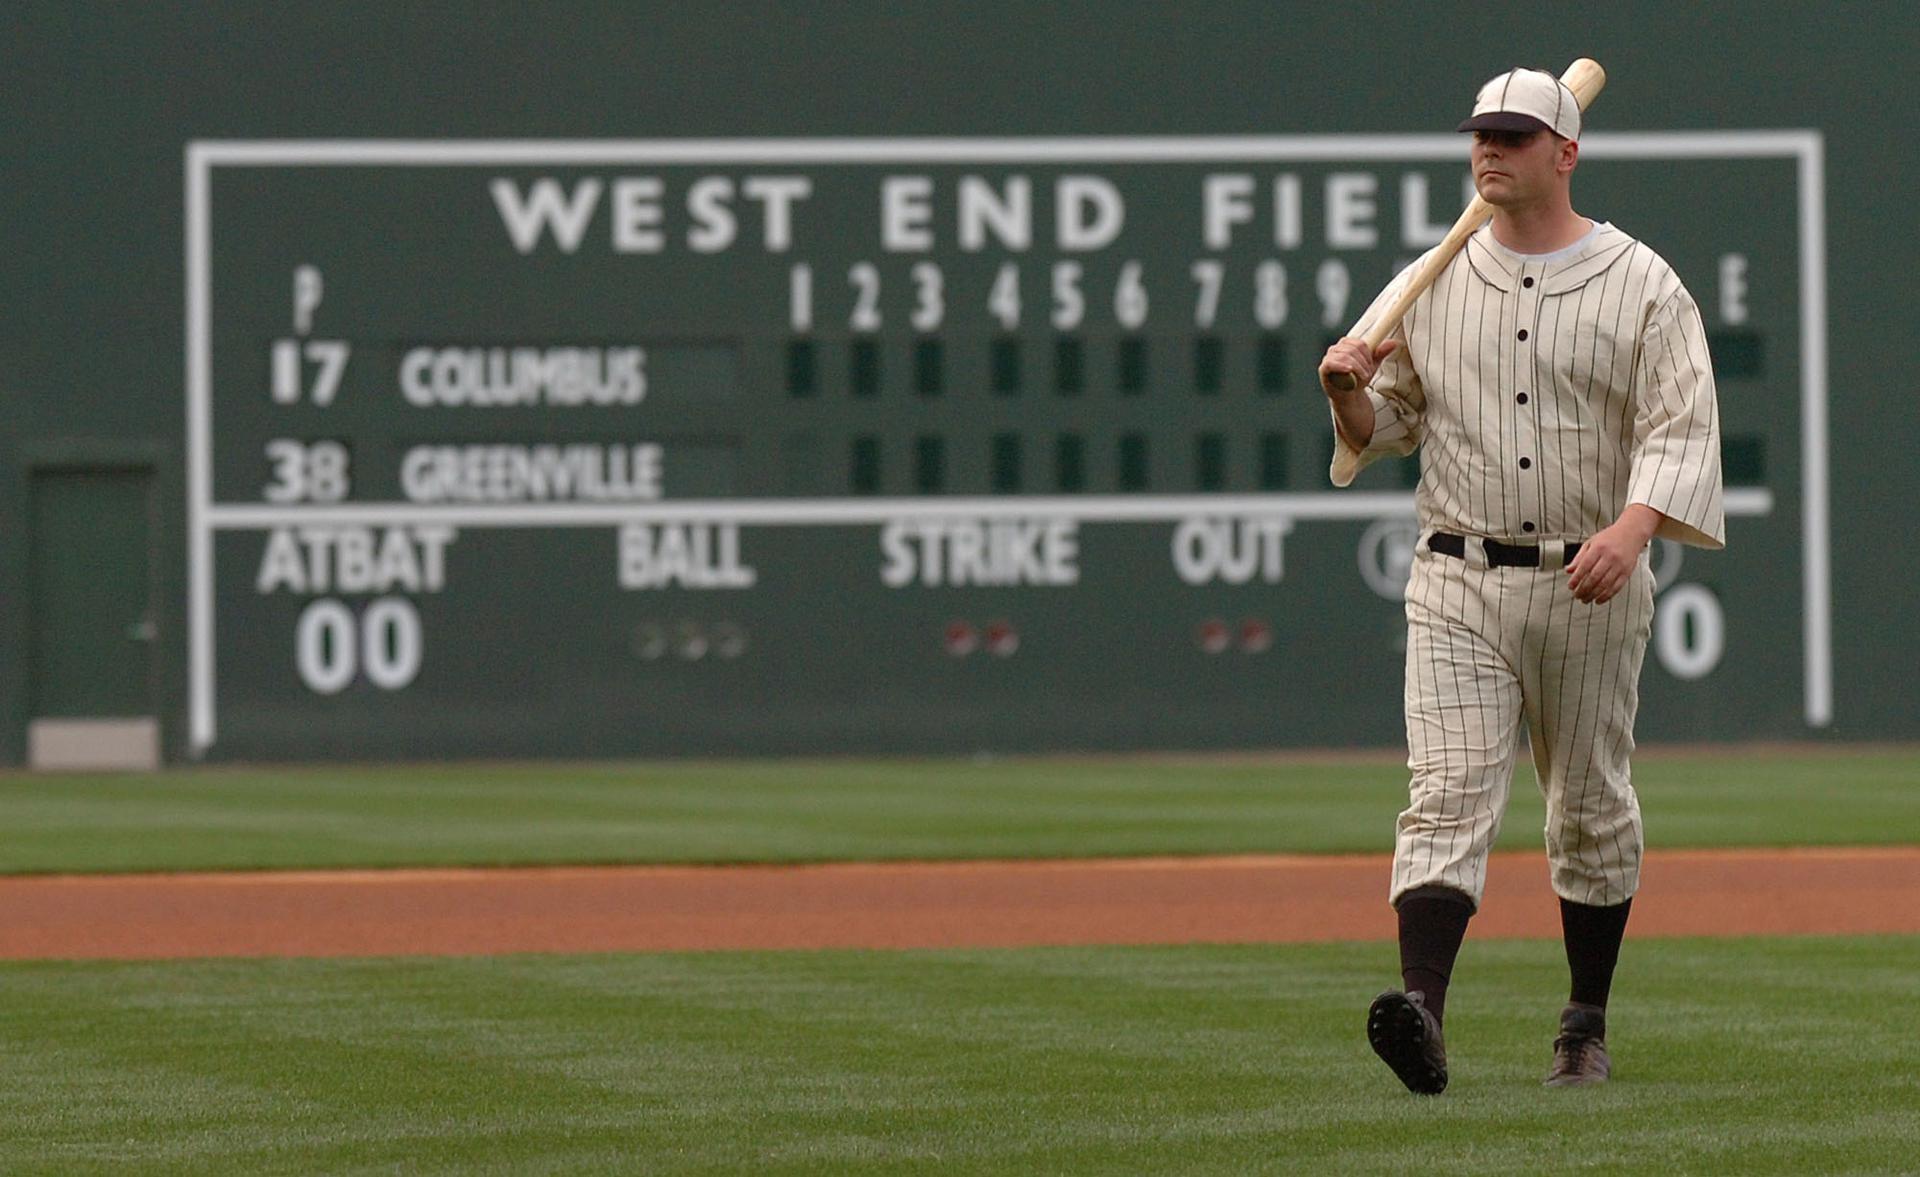 A man dressed in an old-fashioned baseball uniform holding bat walks across field